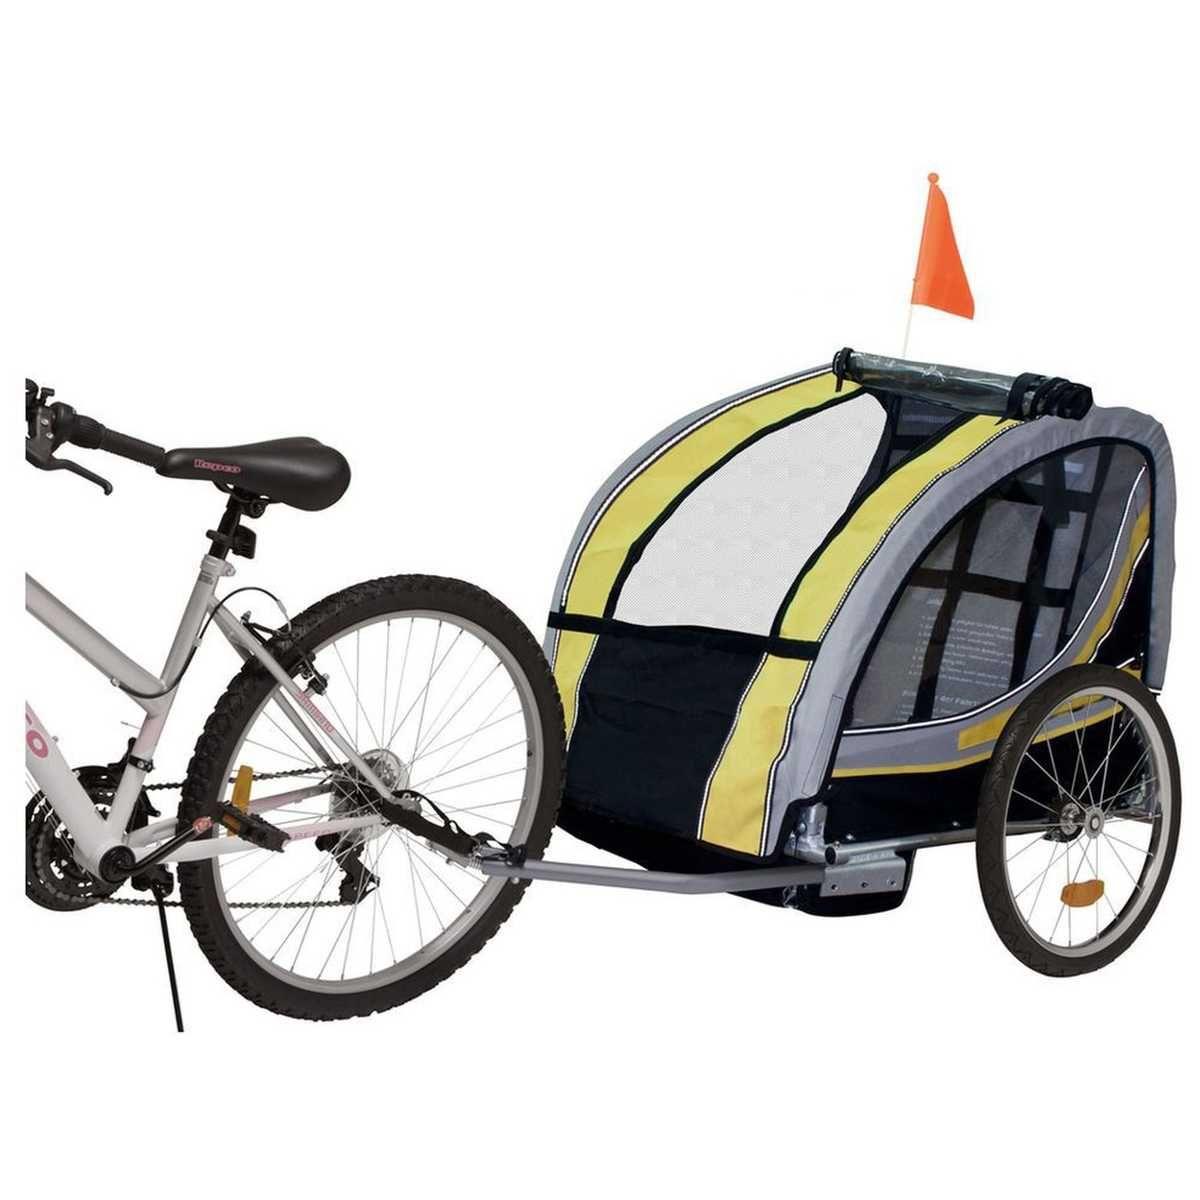 Diamondback Trail A Buggy 2in1 Bike Trailer & Child